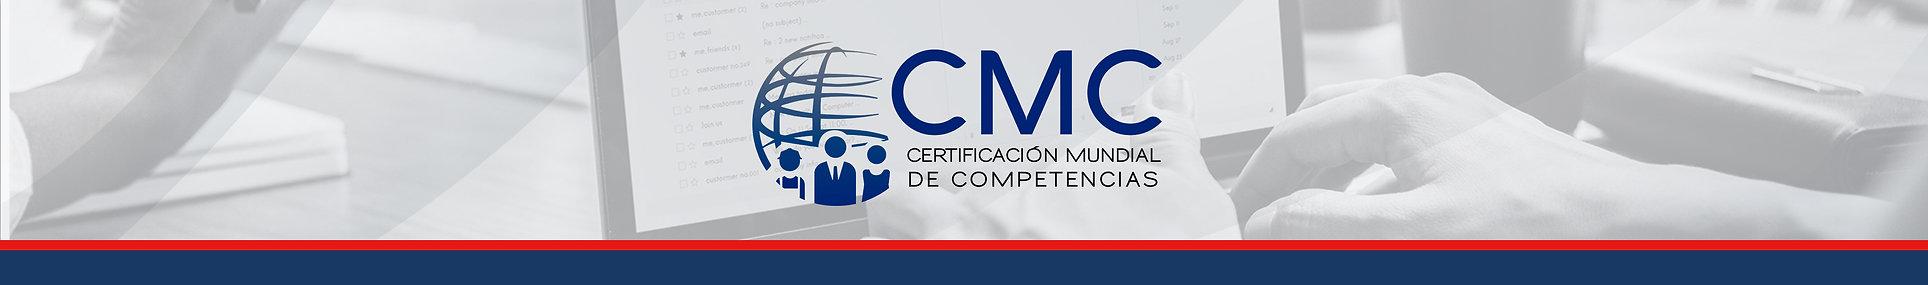 Banner CMC2.1.jpg